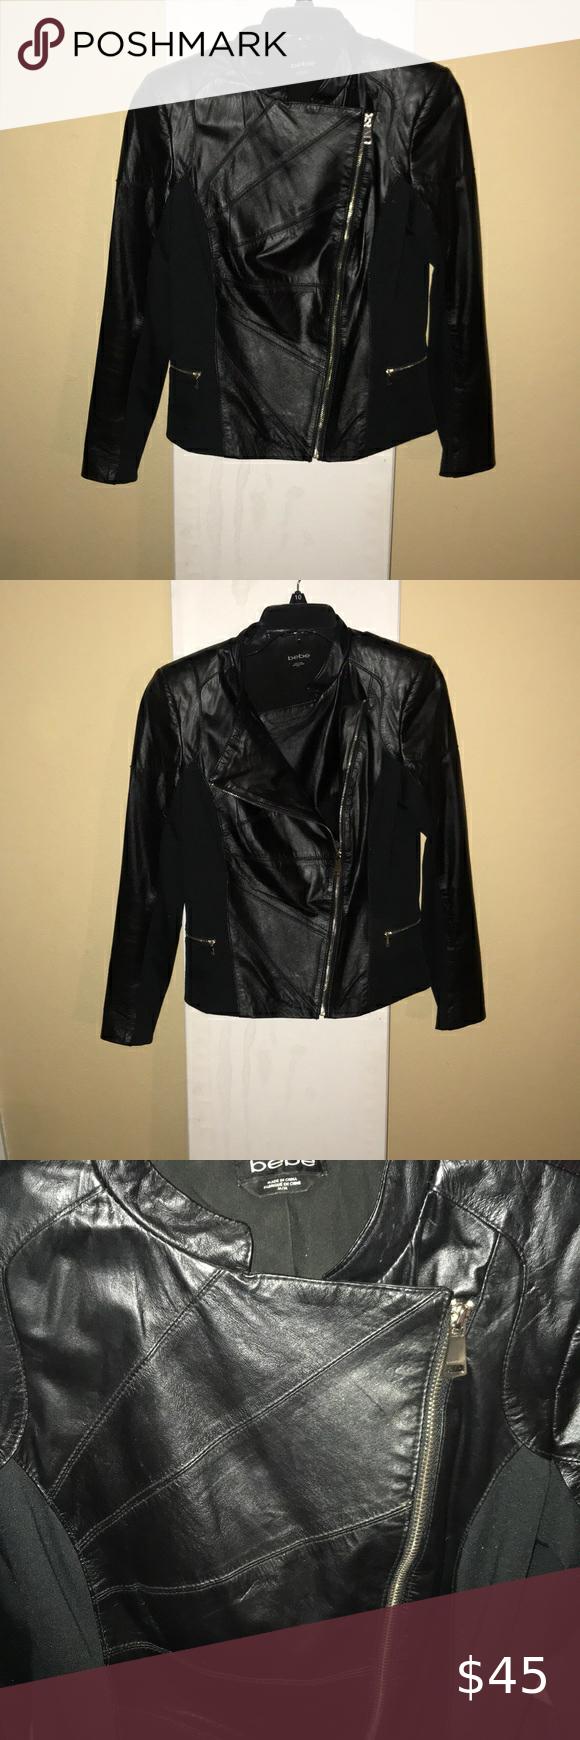 Bebe Black Leather Jacket With Gold Zipper Detail Bebe Black Leather Jacket With Gold Zipper Detail Leather Black Leather Jacket Black Leather Leather Jacket [ 1740 x 580 Pixel ]